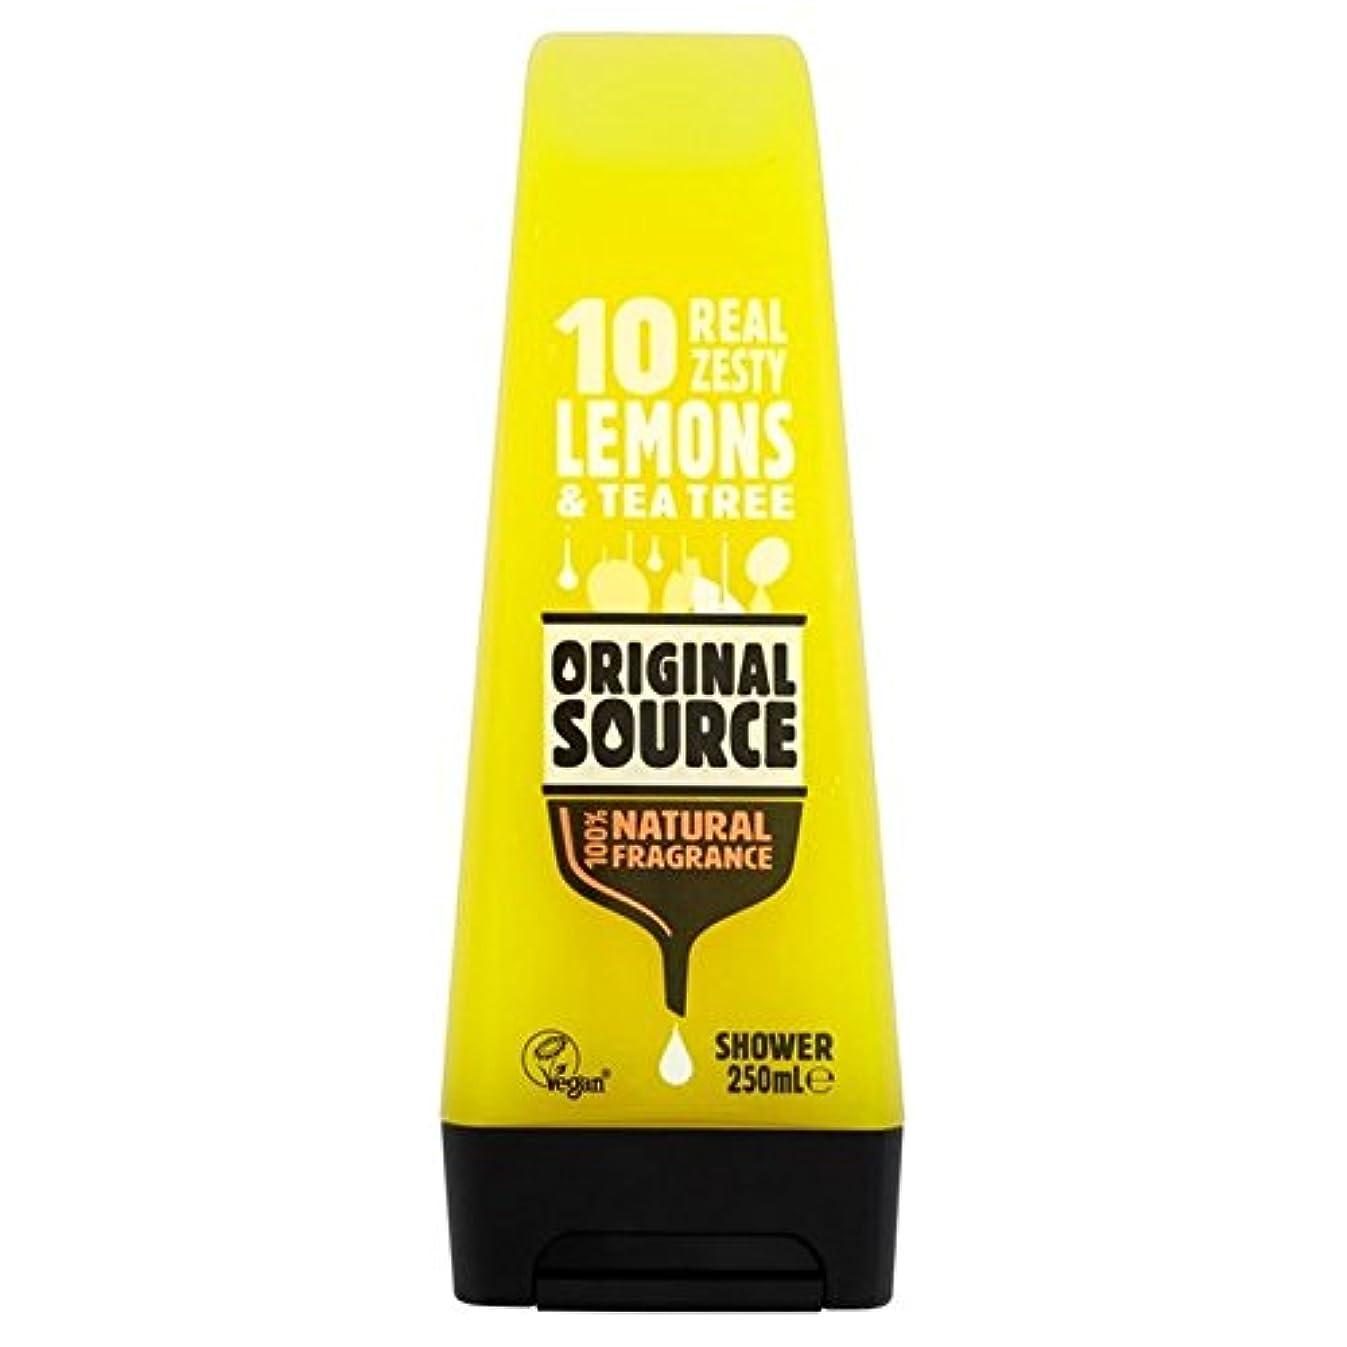 Original Source Lemon Shower Gel 250ml - 元のソースのレモンシャワージェル250ミリリットル [並行輸入品]